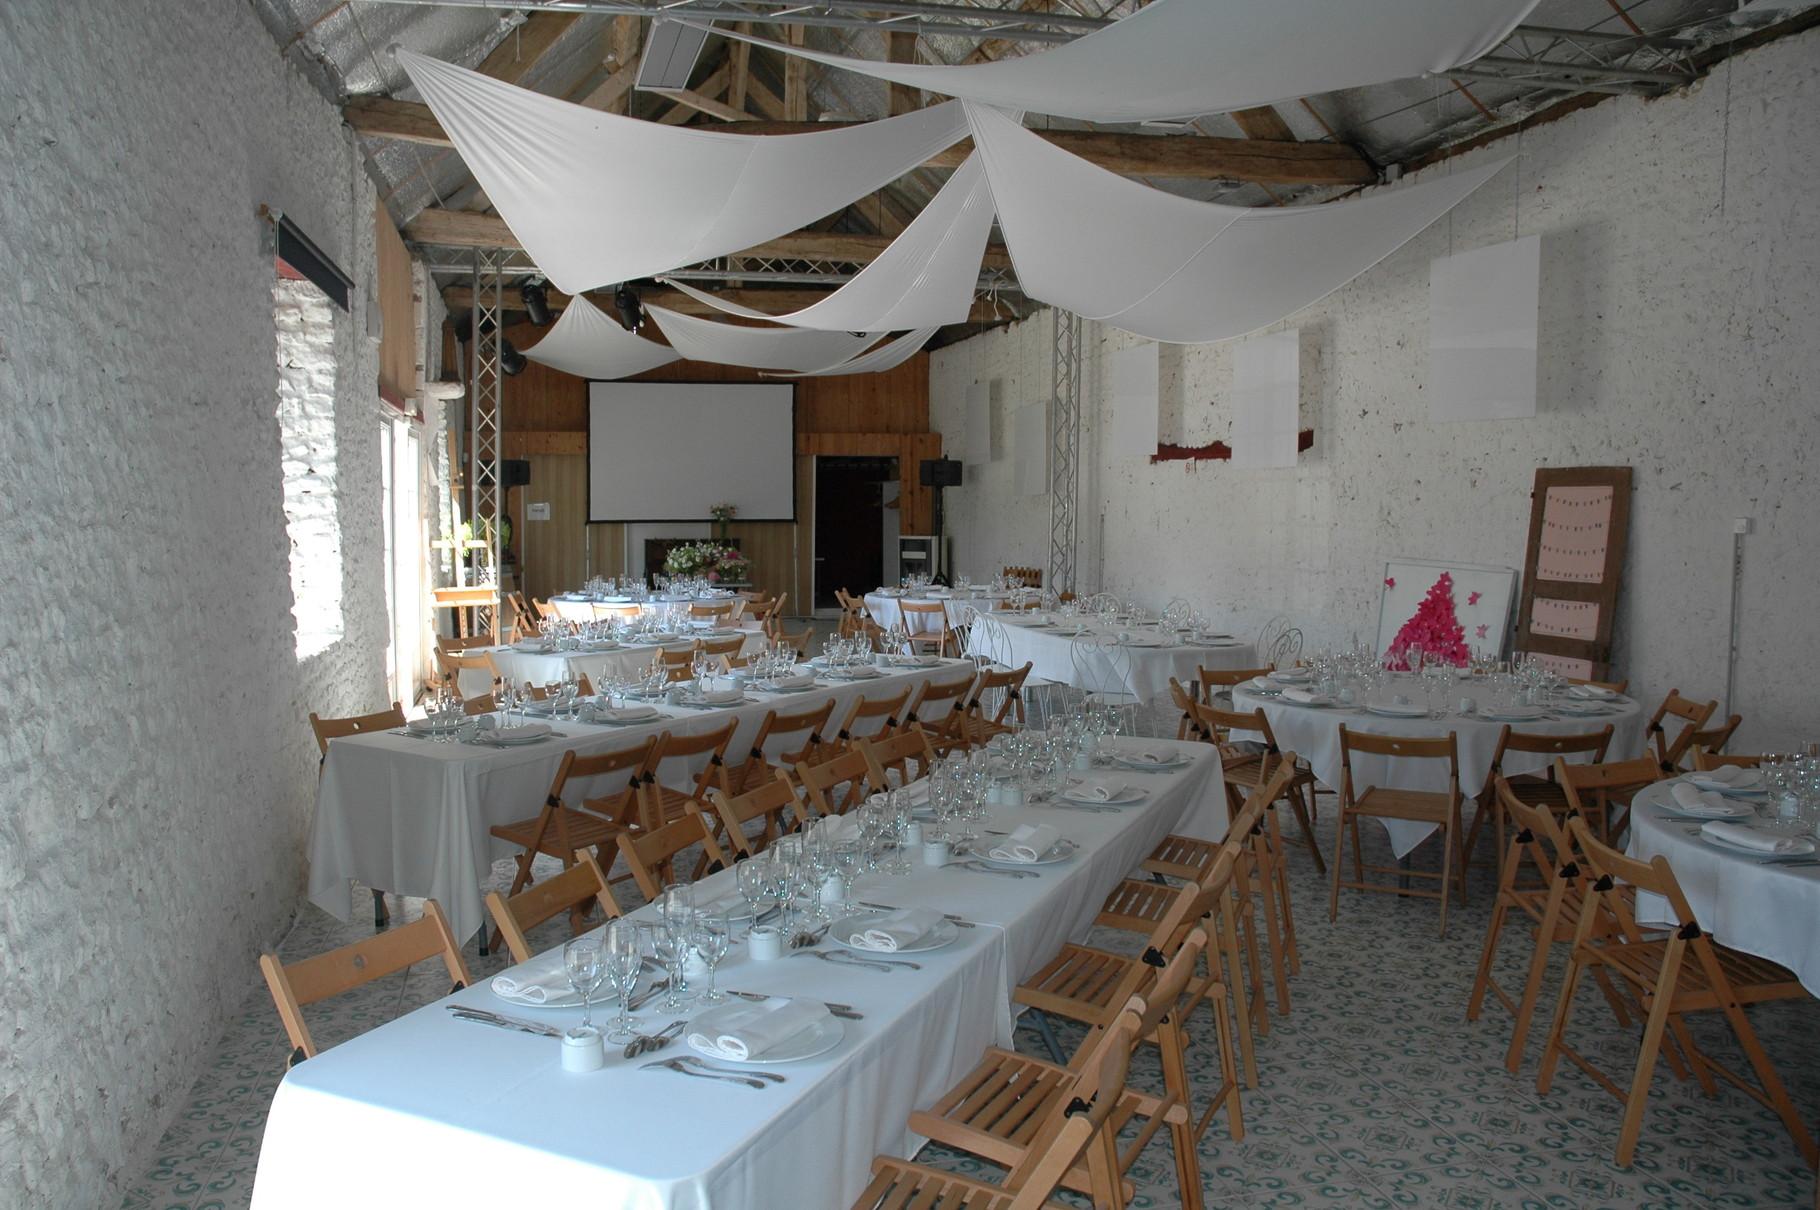 mariage en sarthe gite mariage sarthe site de grillemont - Gite Sarthe Mariage